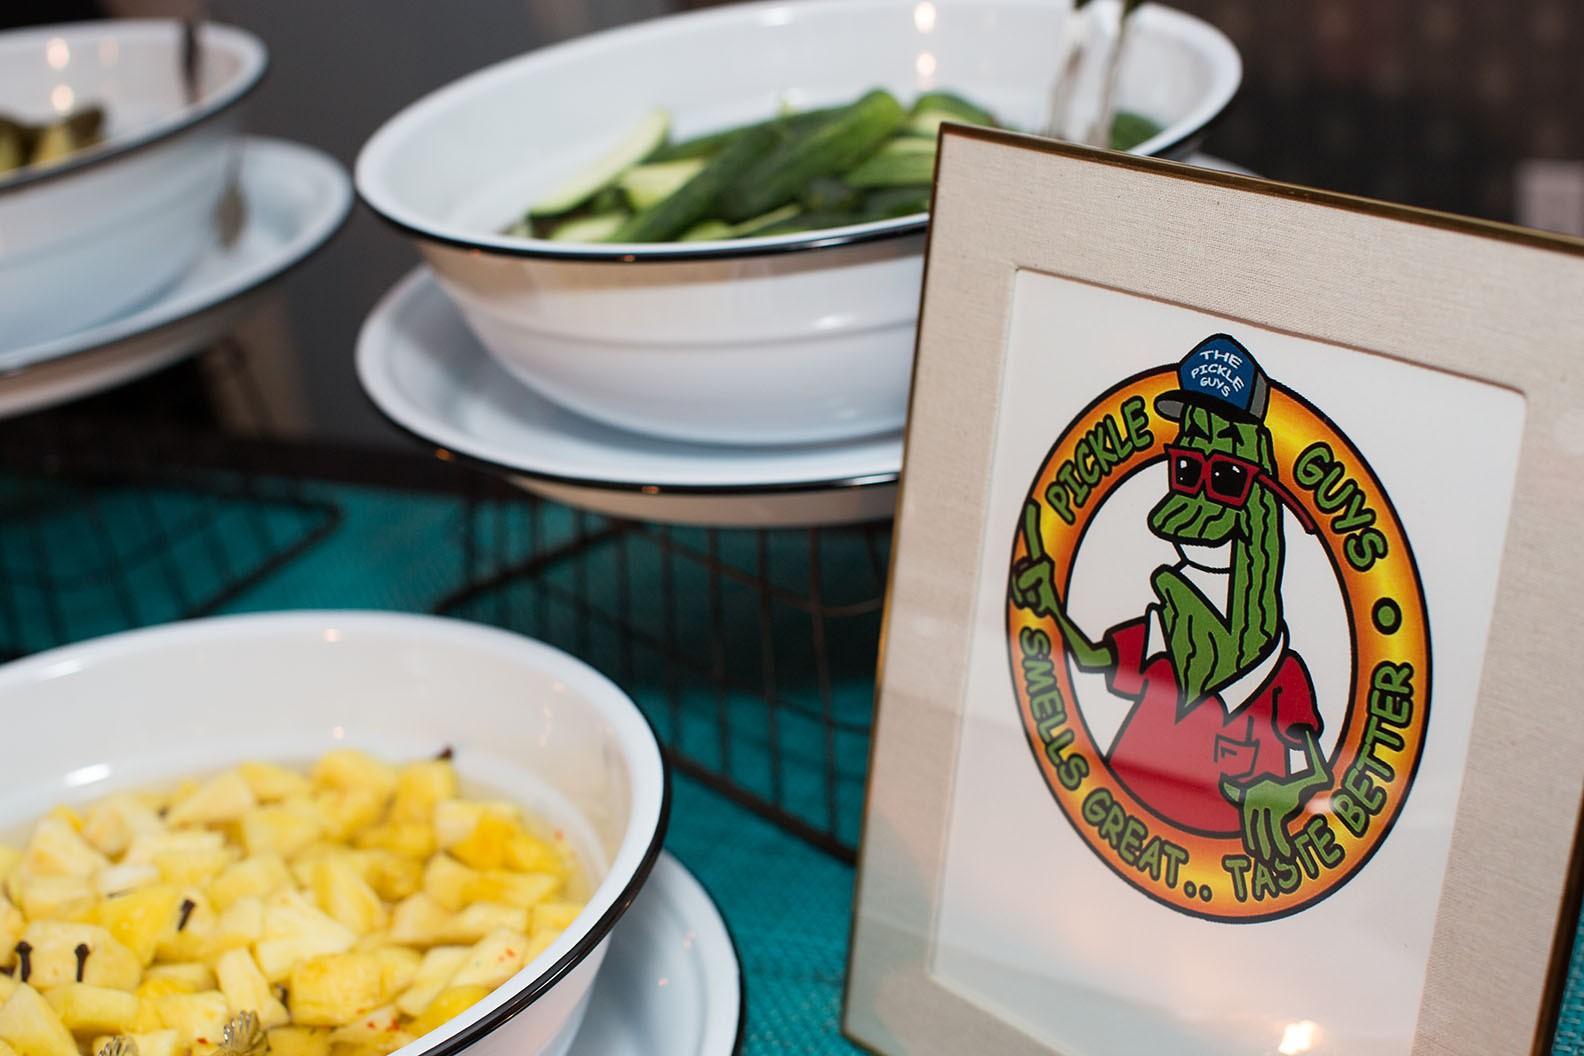 Pickle Guys table display